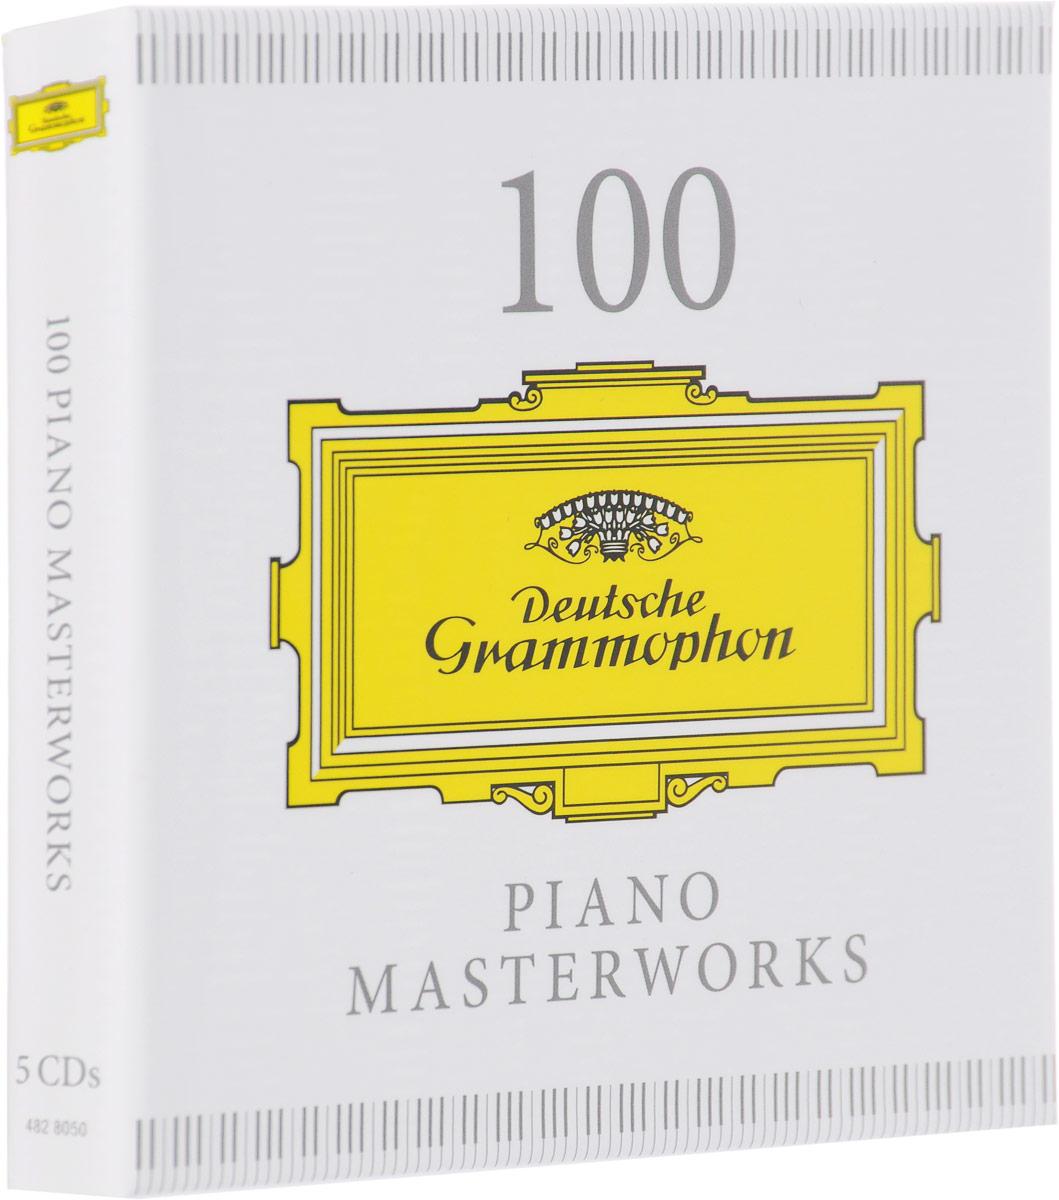 Иоганн Себастьян Бах,Фредерик Шопен,Модест Мусоргский 100 Piano Masterworks (5 CD) фредерик шопен ноктюрн f moll